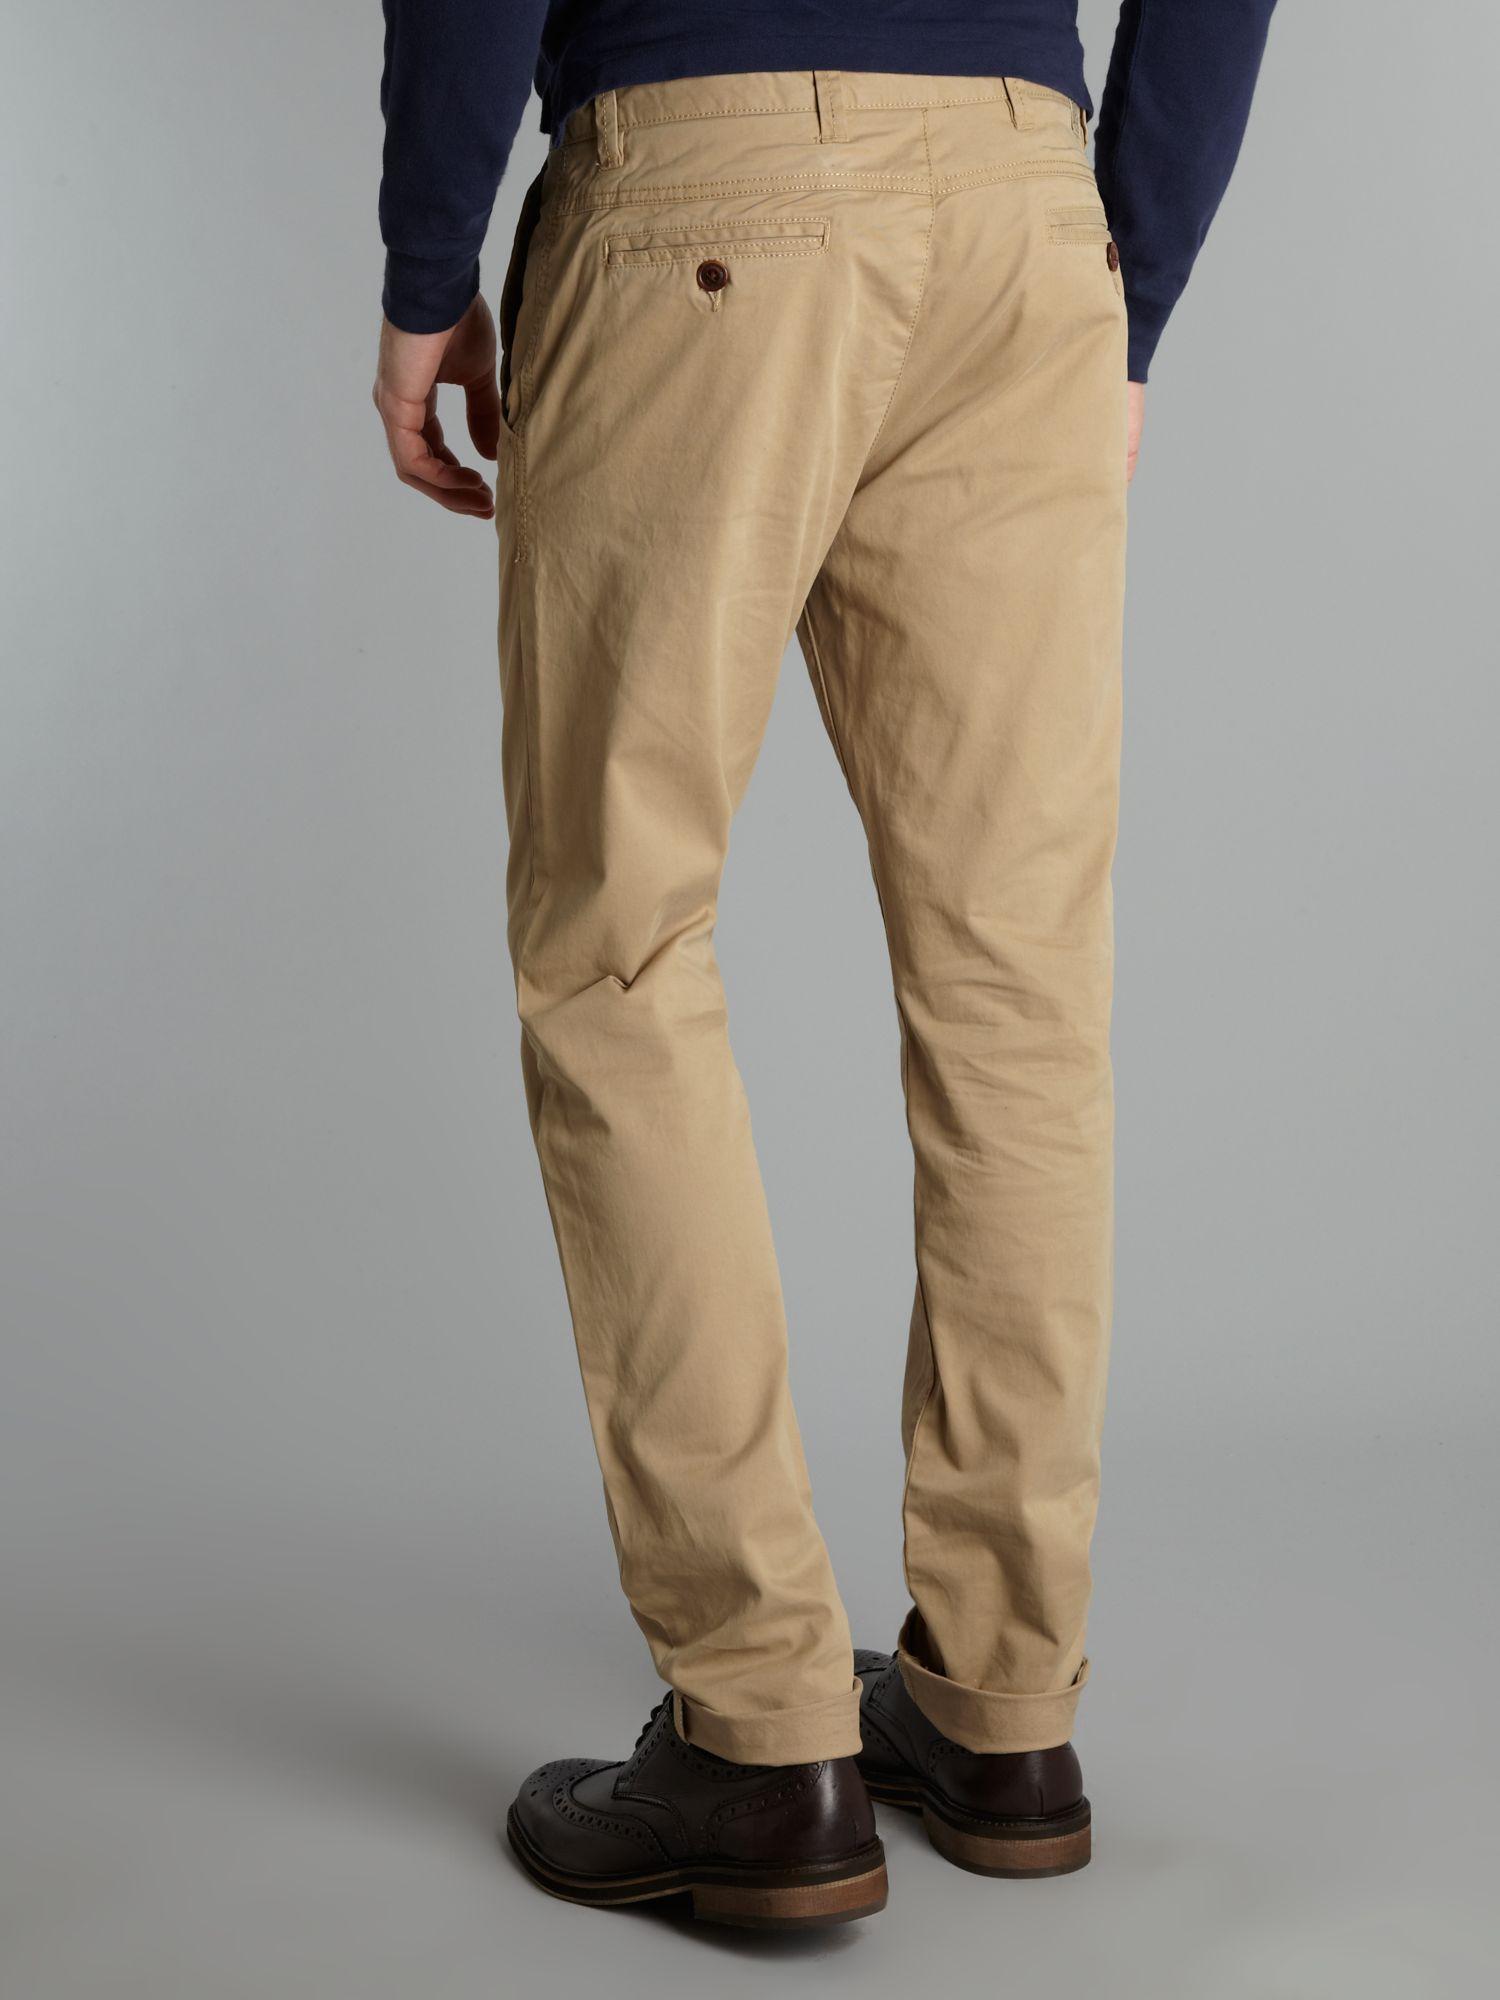 Coton Sergé Hommes Chinos Pantalon Adapté Tommy Hilfiger qfYqNHANy1